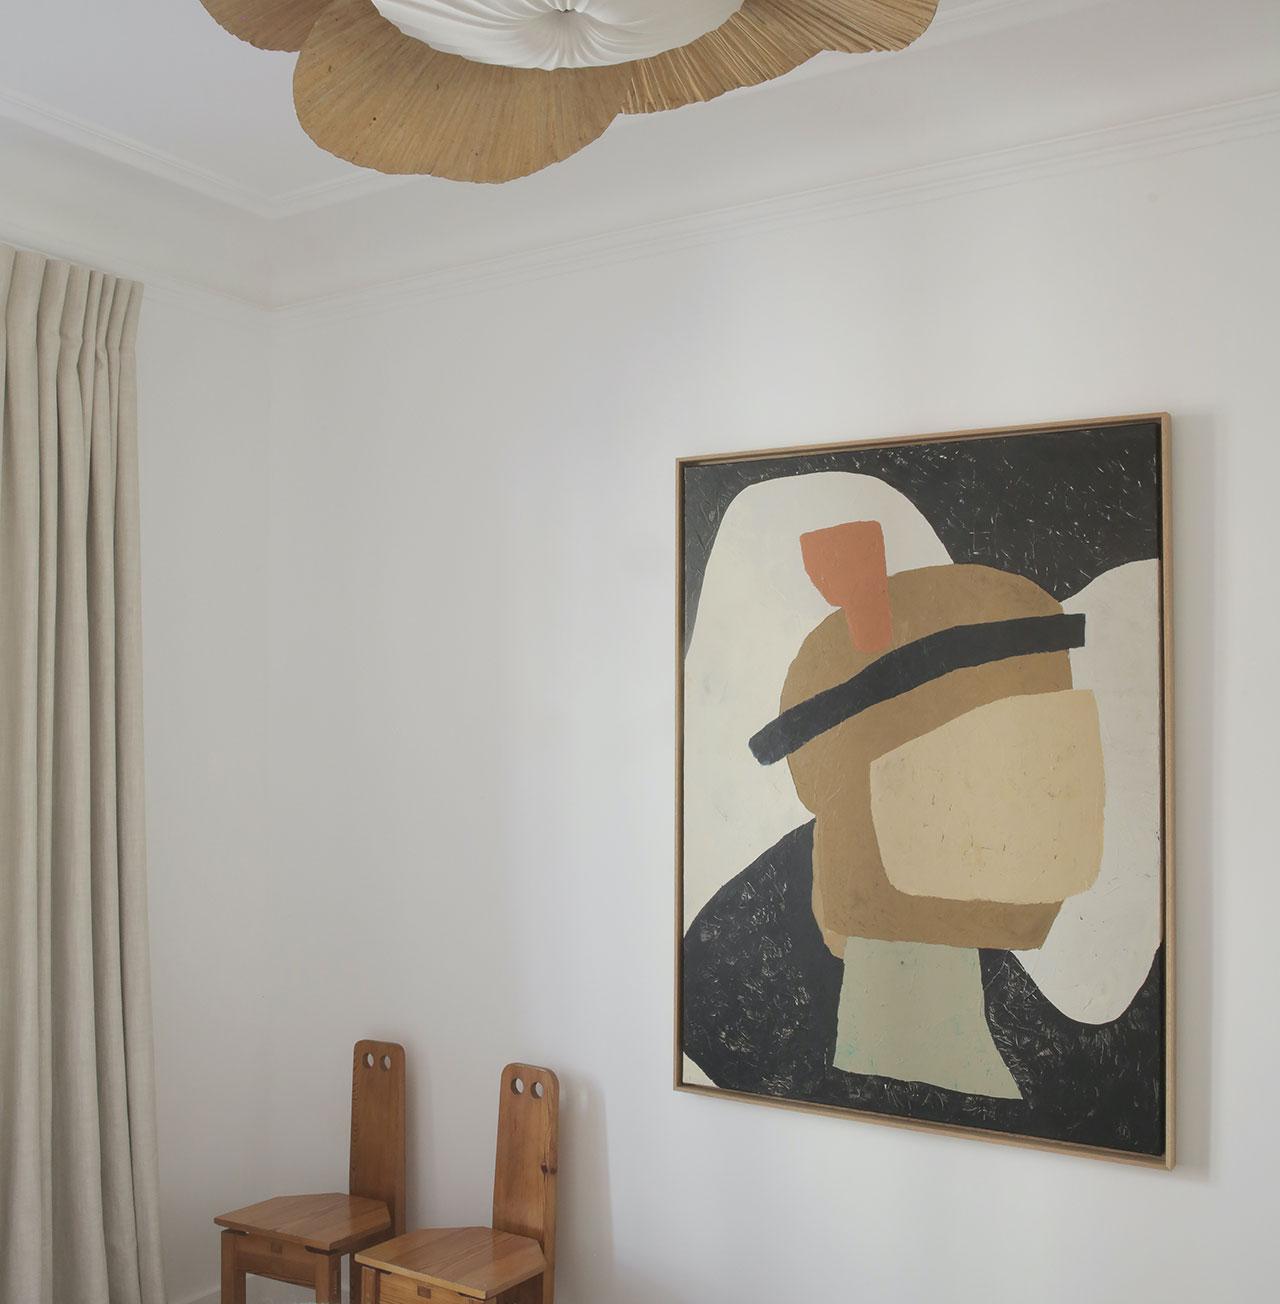 Paintingby Hermentaire (Damien de Medeiros), 2019.Acrylic on canvas.114 cm x 146 cm. Photography by Damien de Medeiros.